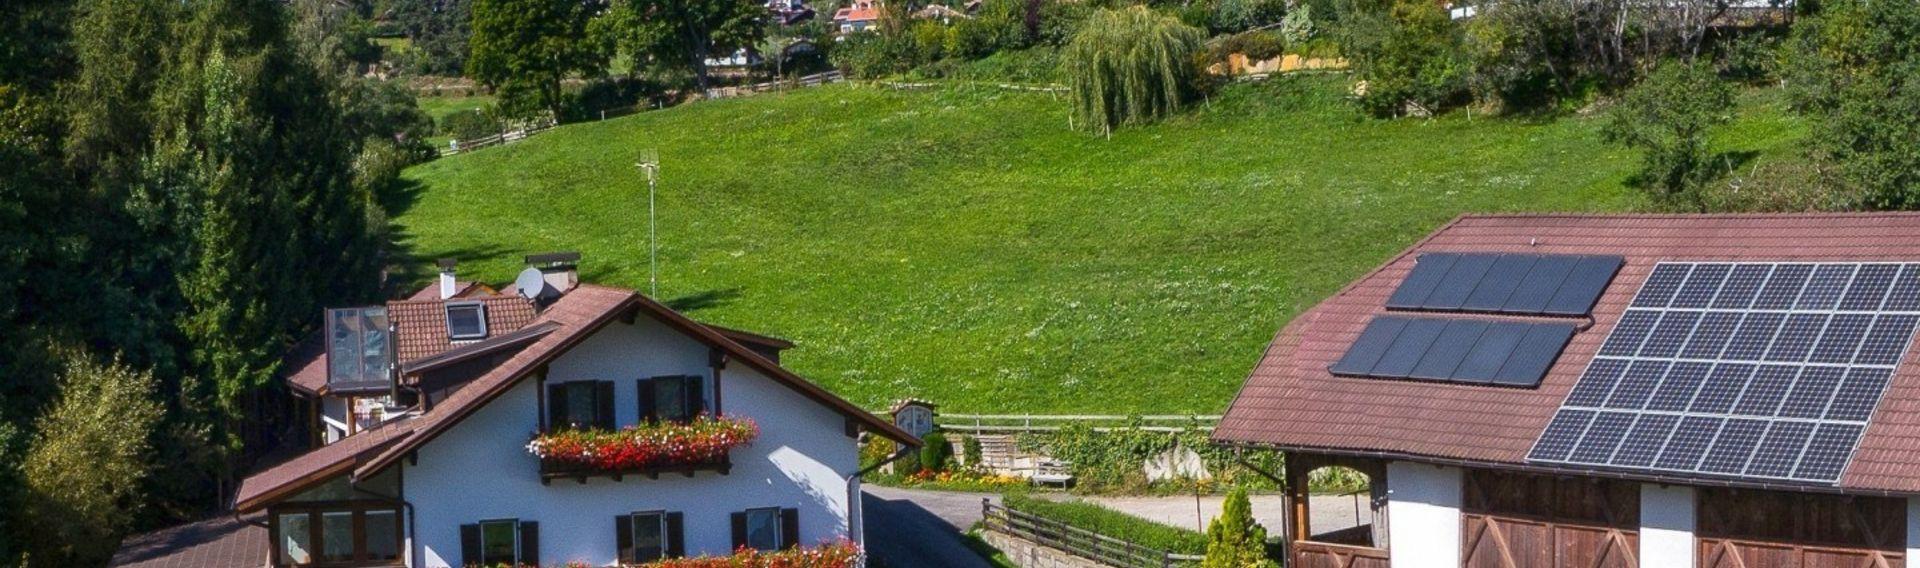 Urlaub Südtirol Bauernhof – Moosbachhof